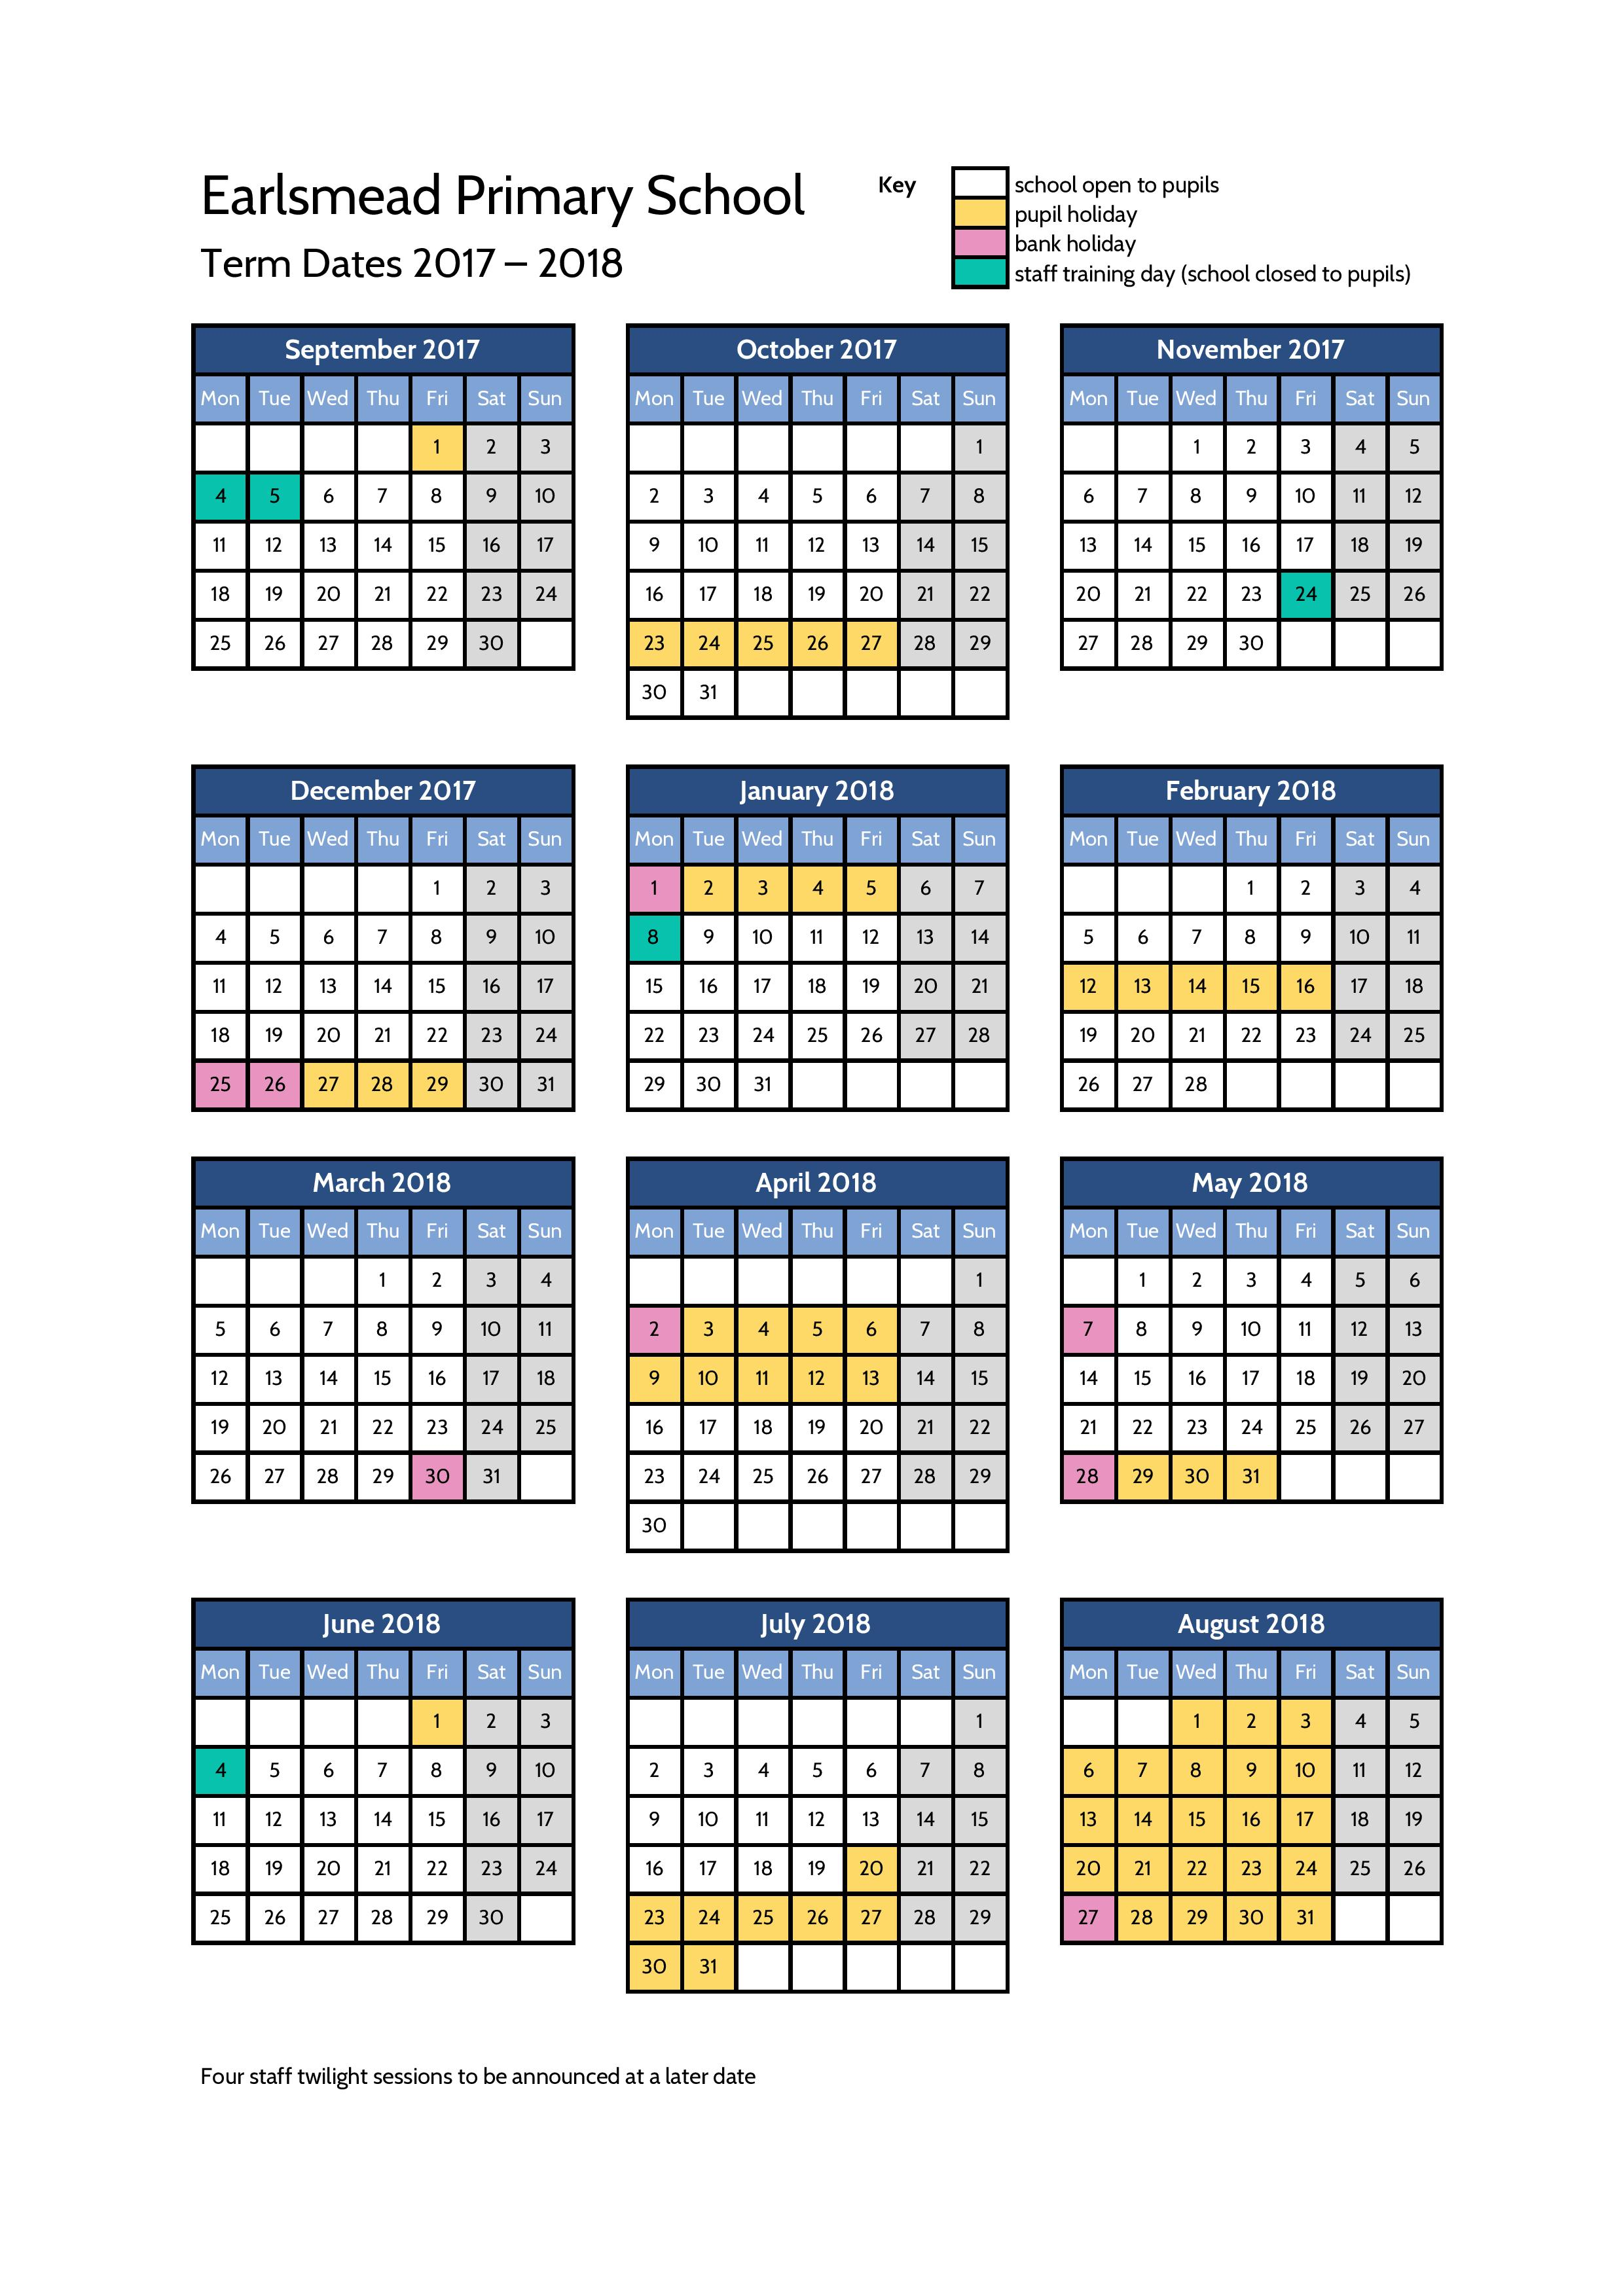 Earlsmead School Term Dates 2017-18 - Term Dates-page-001.jpg